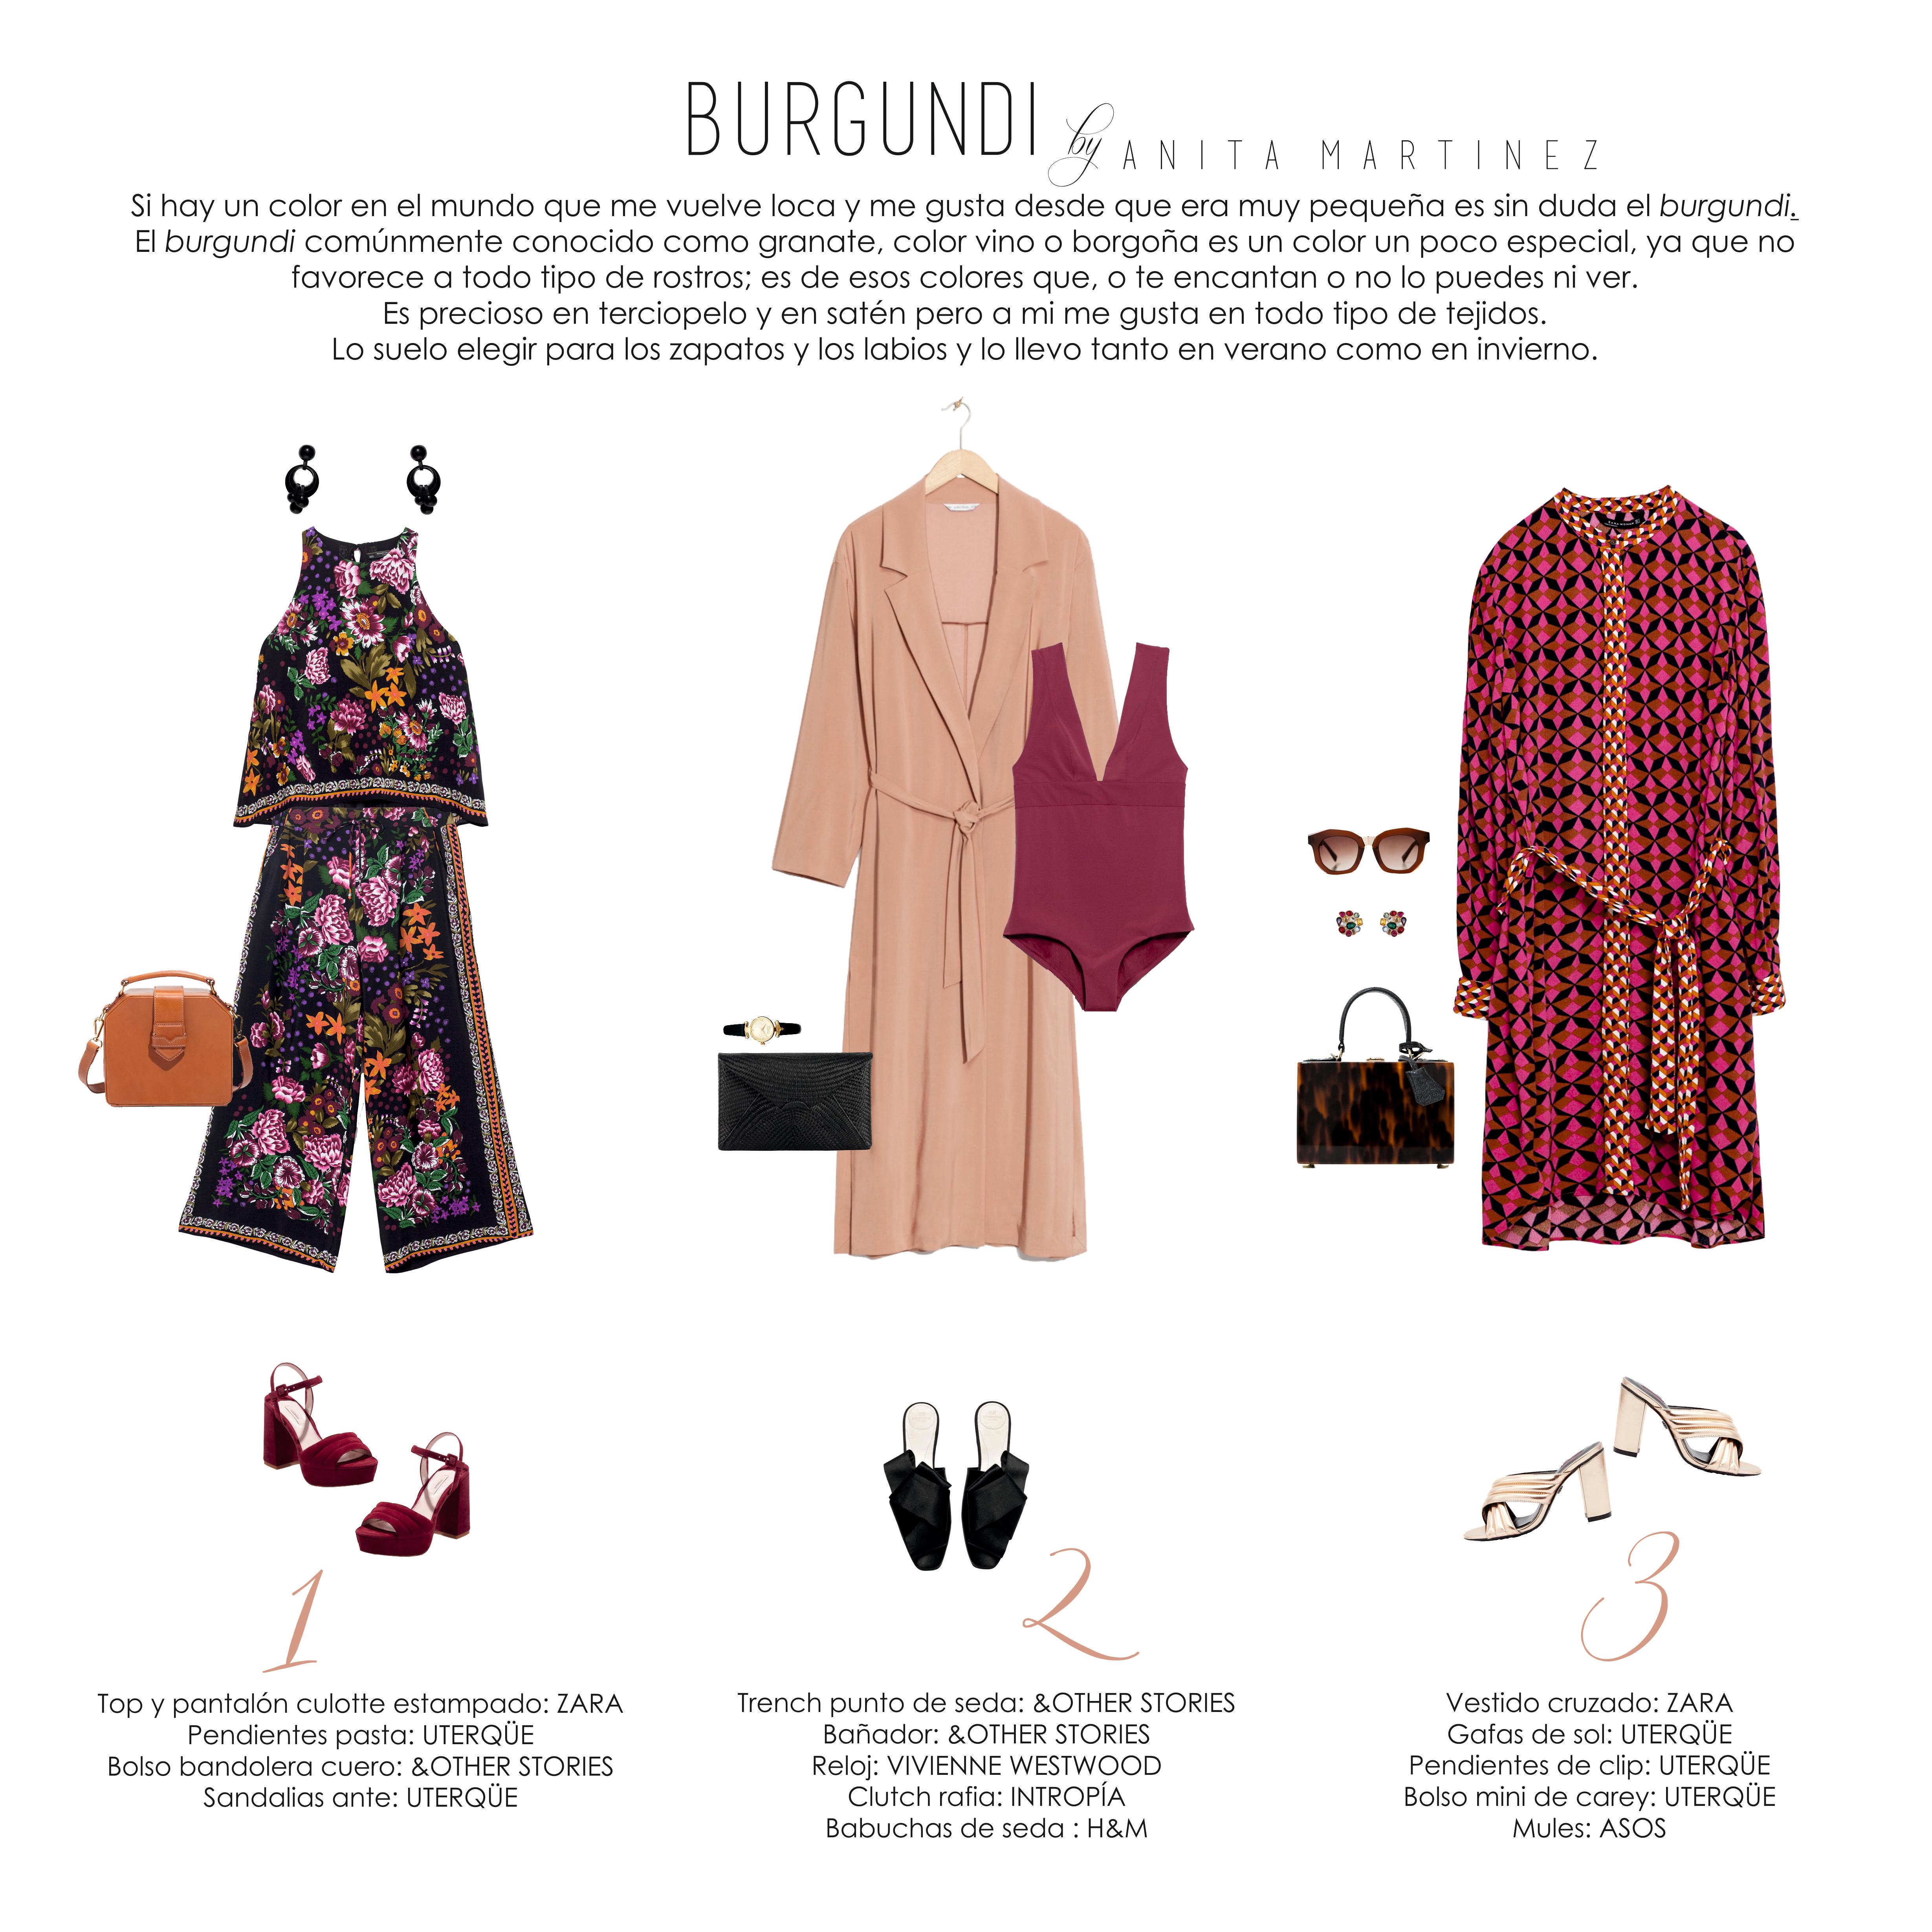 BURGUNDY by ANITA MARTÍNEZ